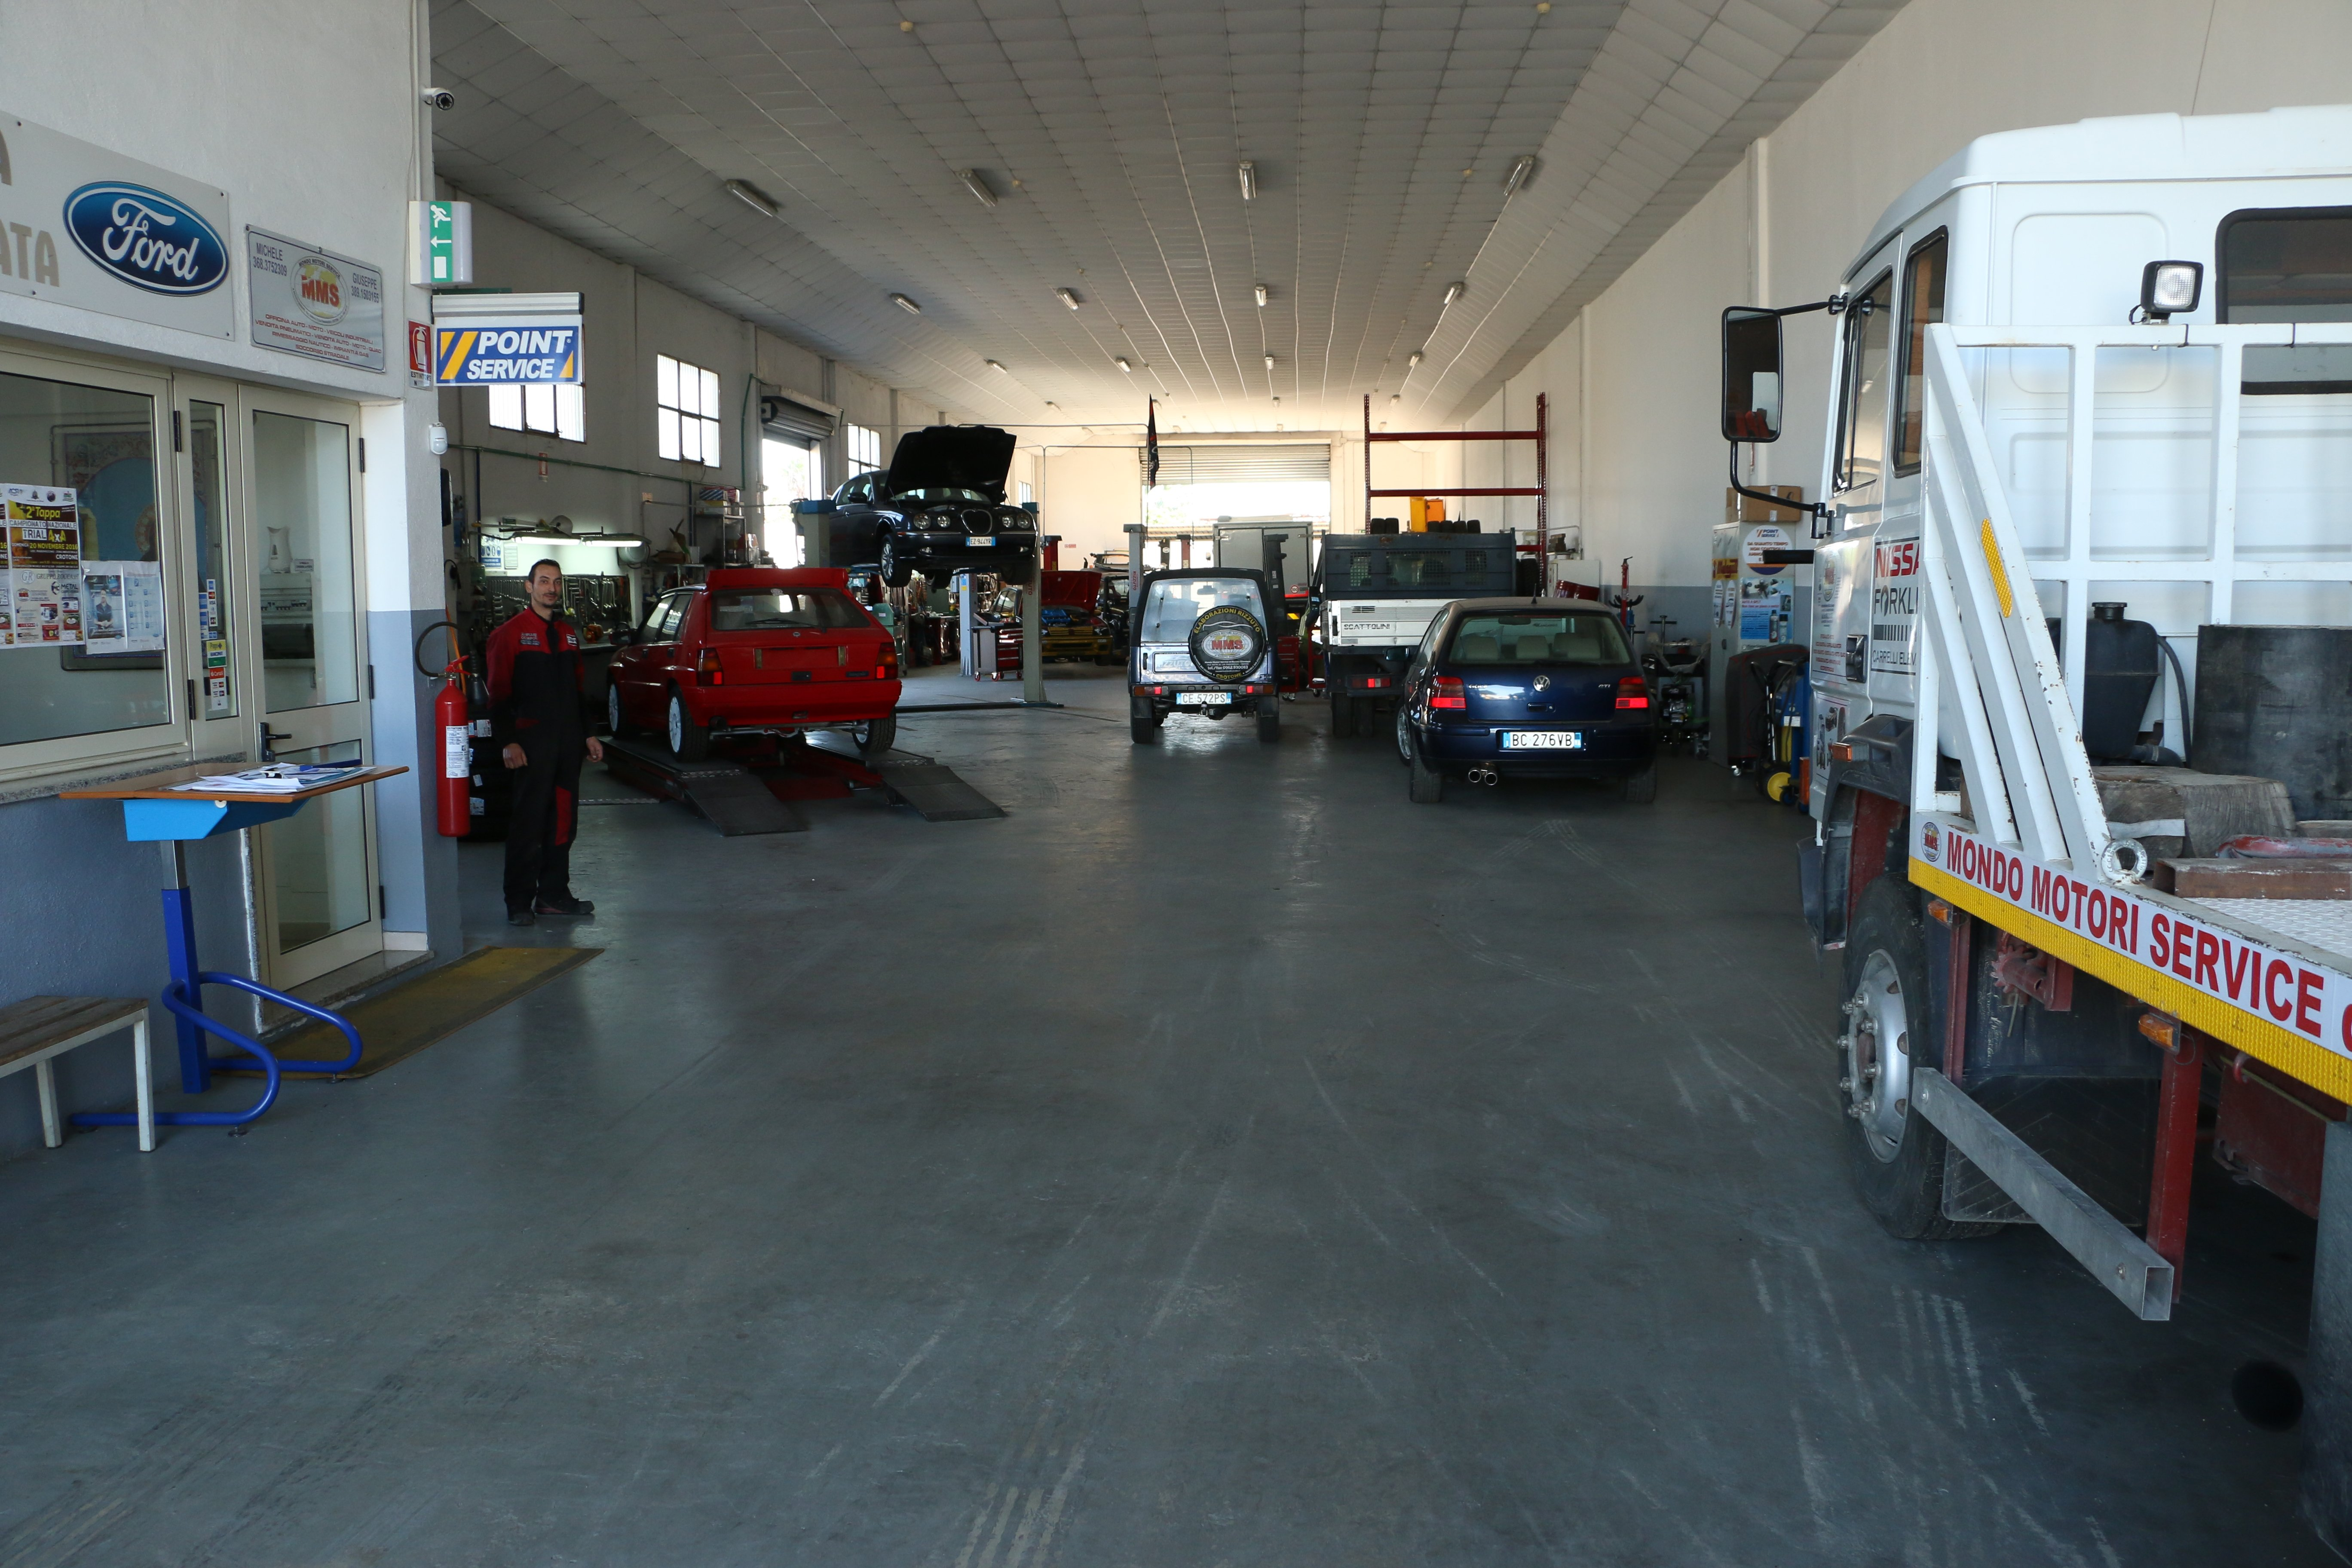 Officina di Mondo Motori Service, Rizzuto Giuseppe, a Crotone